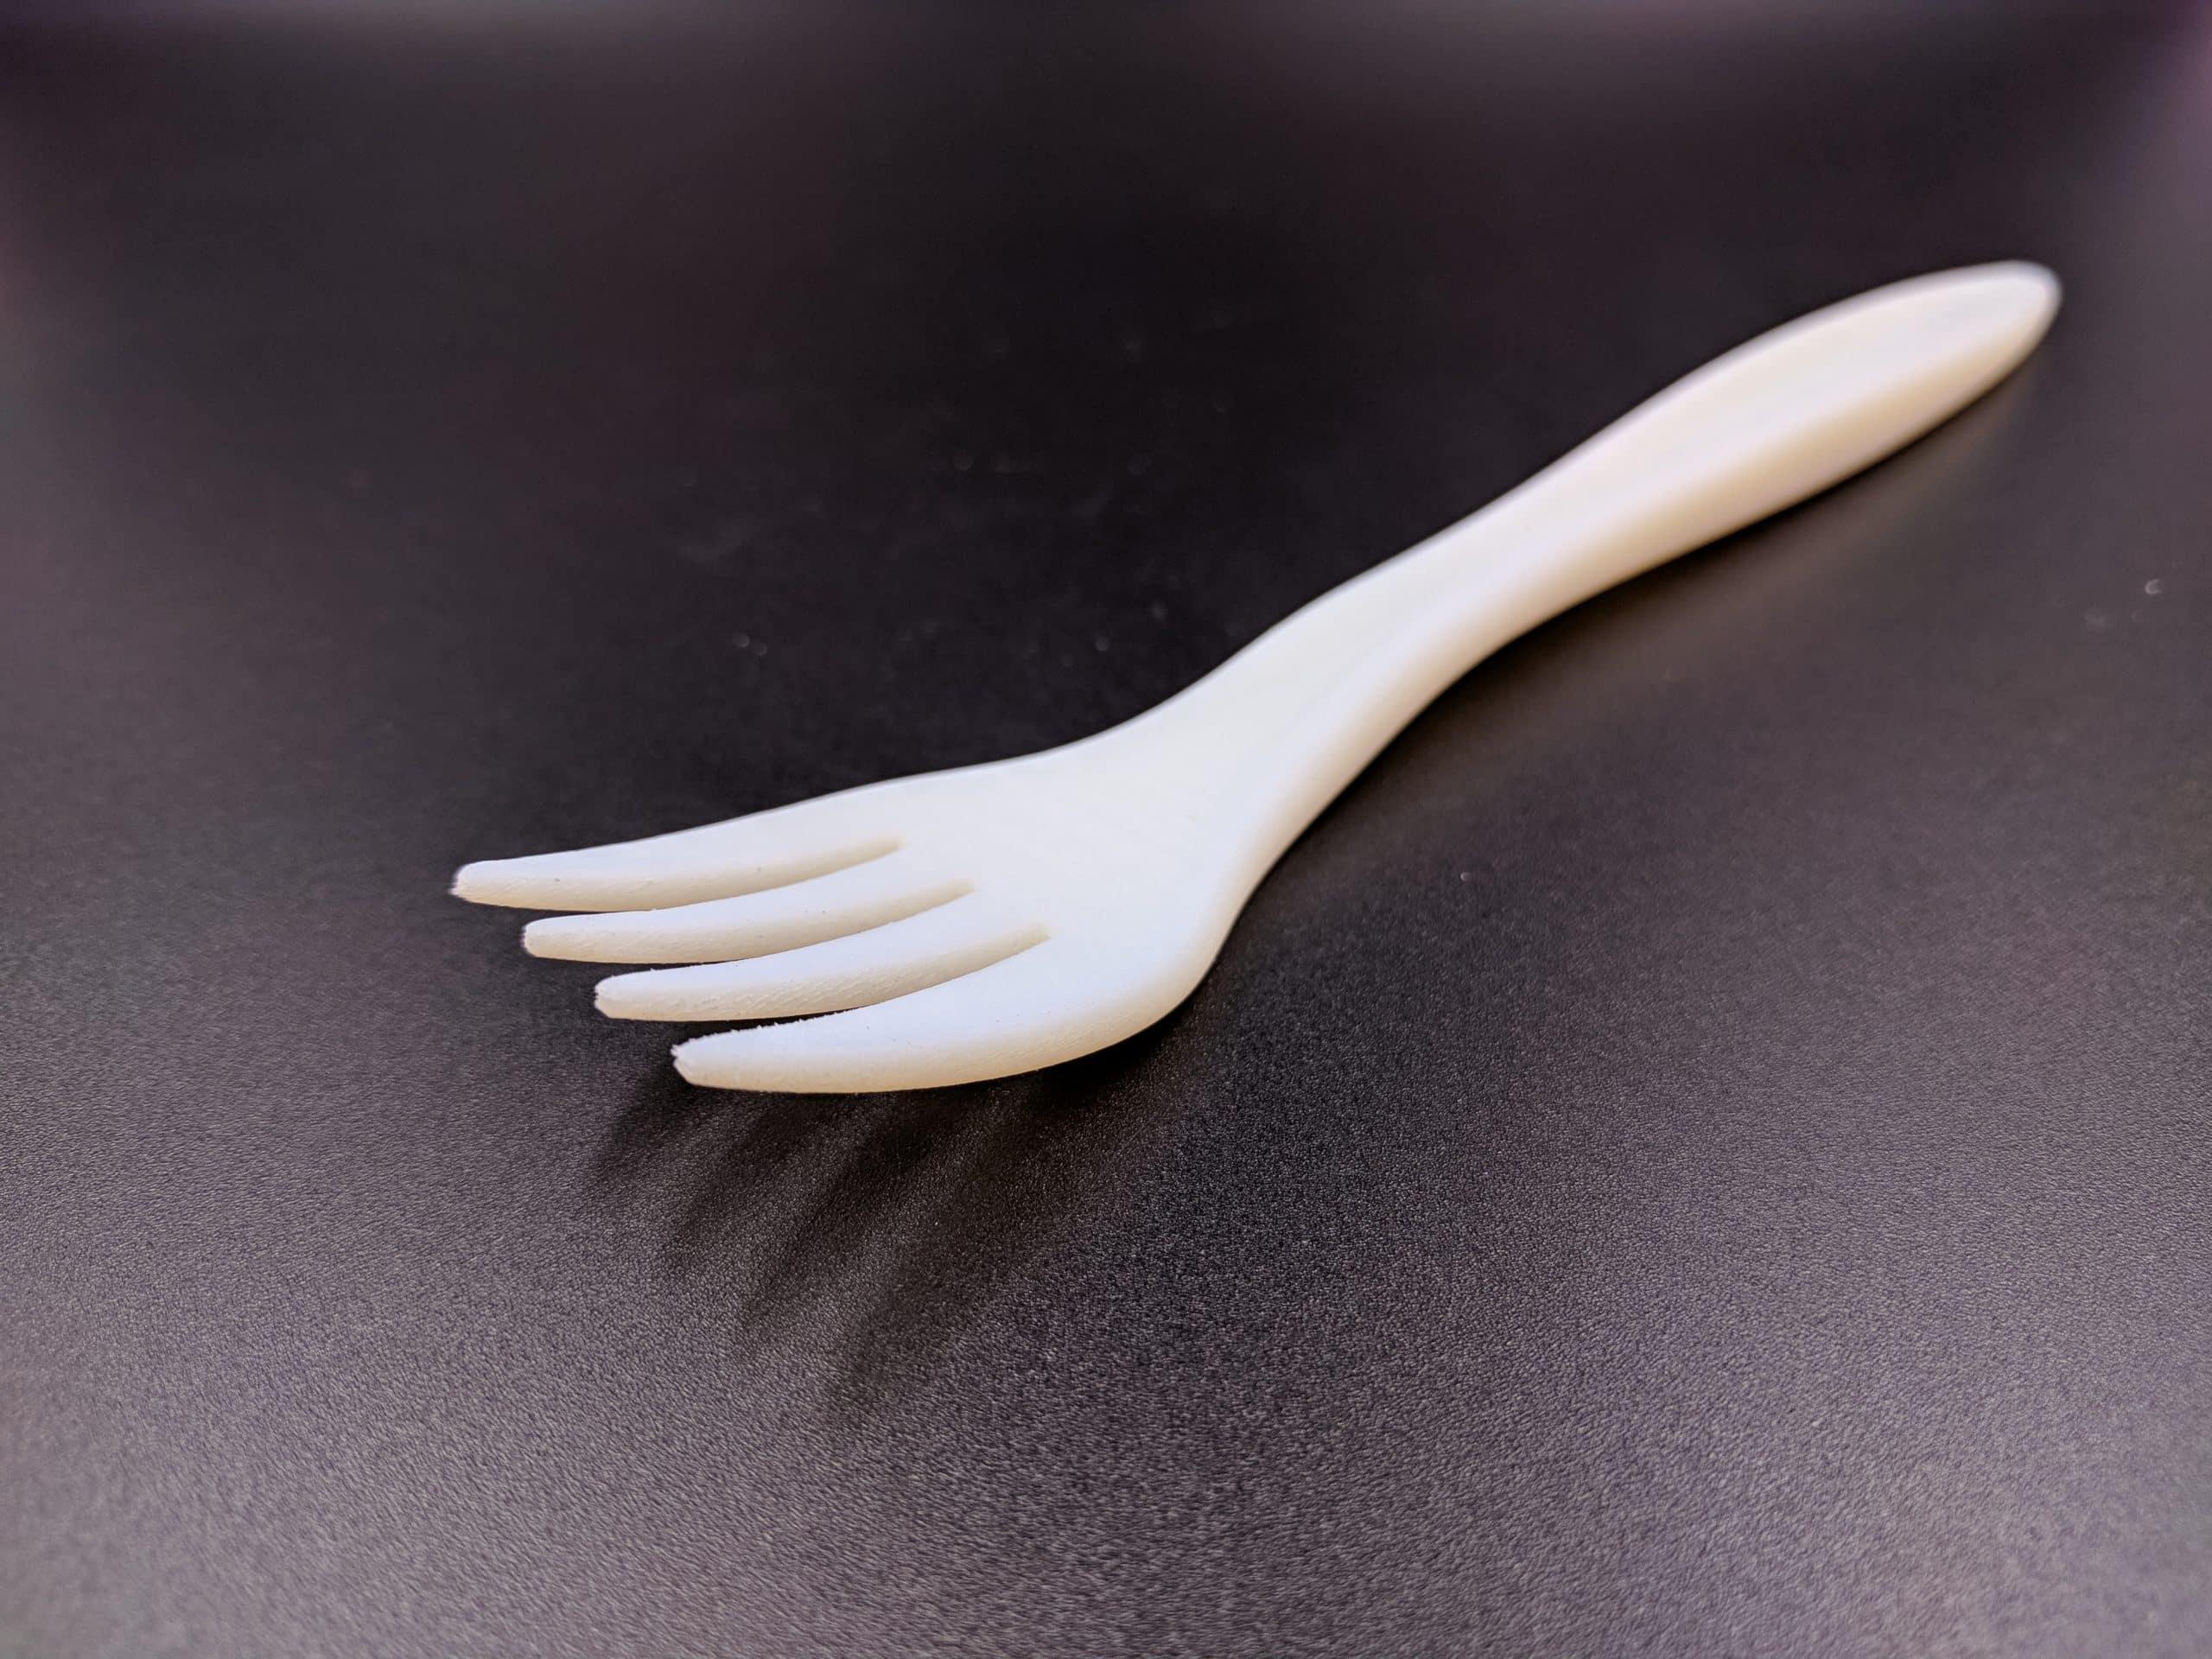 Polyjet fork polyprop-like matte surface finish